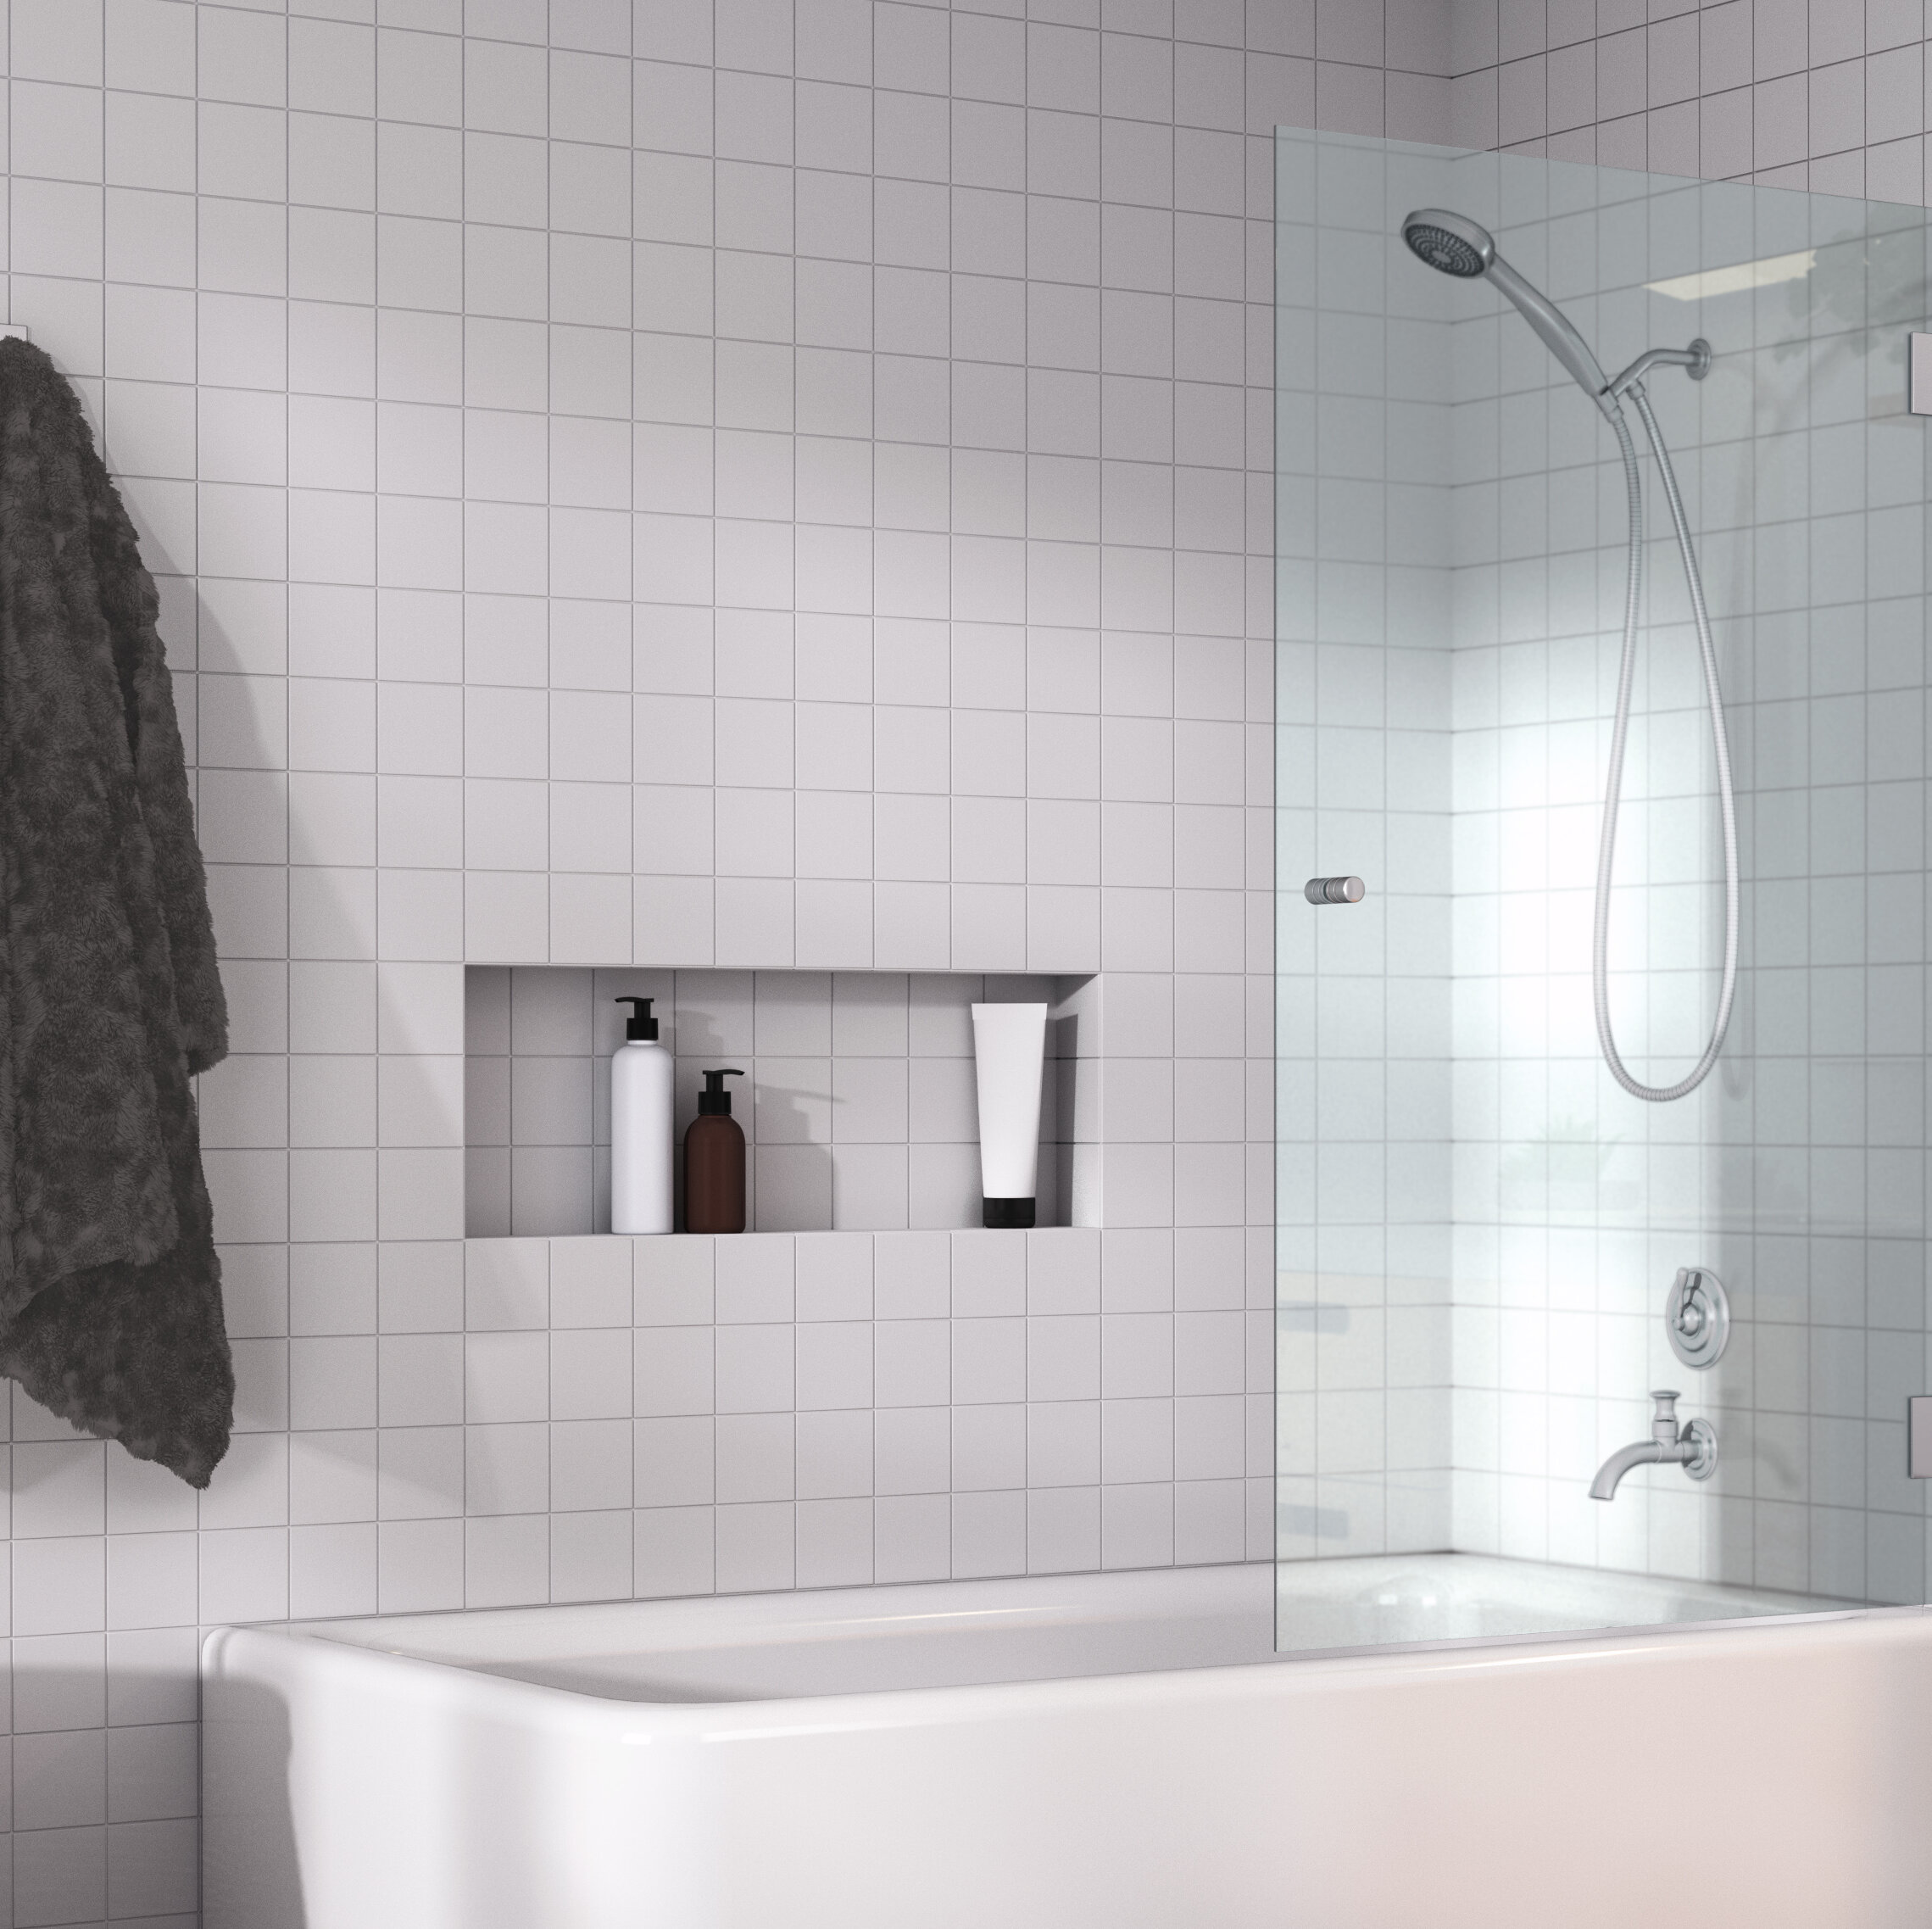 Glass Warehouse 31 75 W X 58 H Hinged Frameless Tub Door Reviews Wayfair